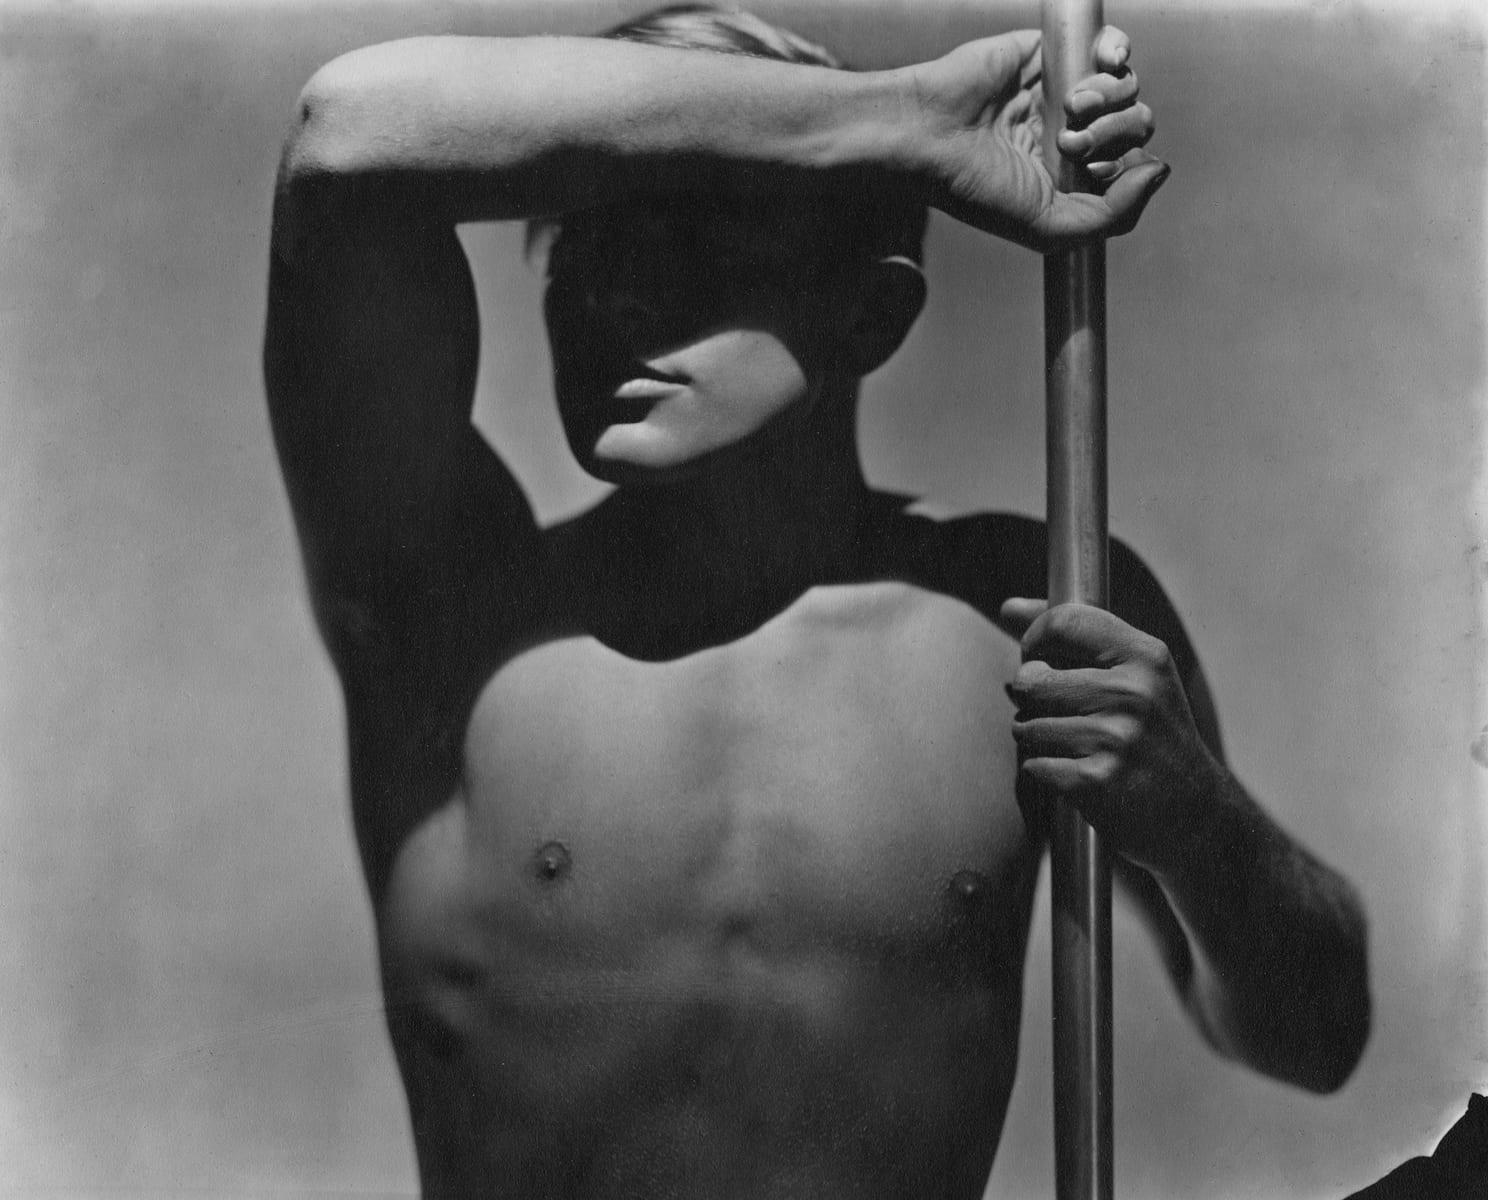 George Hoyningen-Huene, Horst Torso, Paris